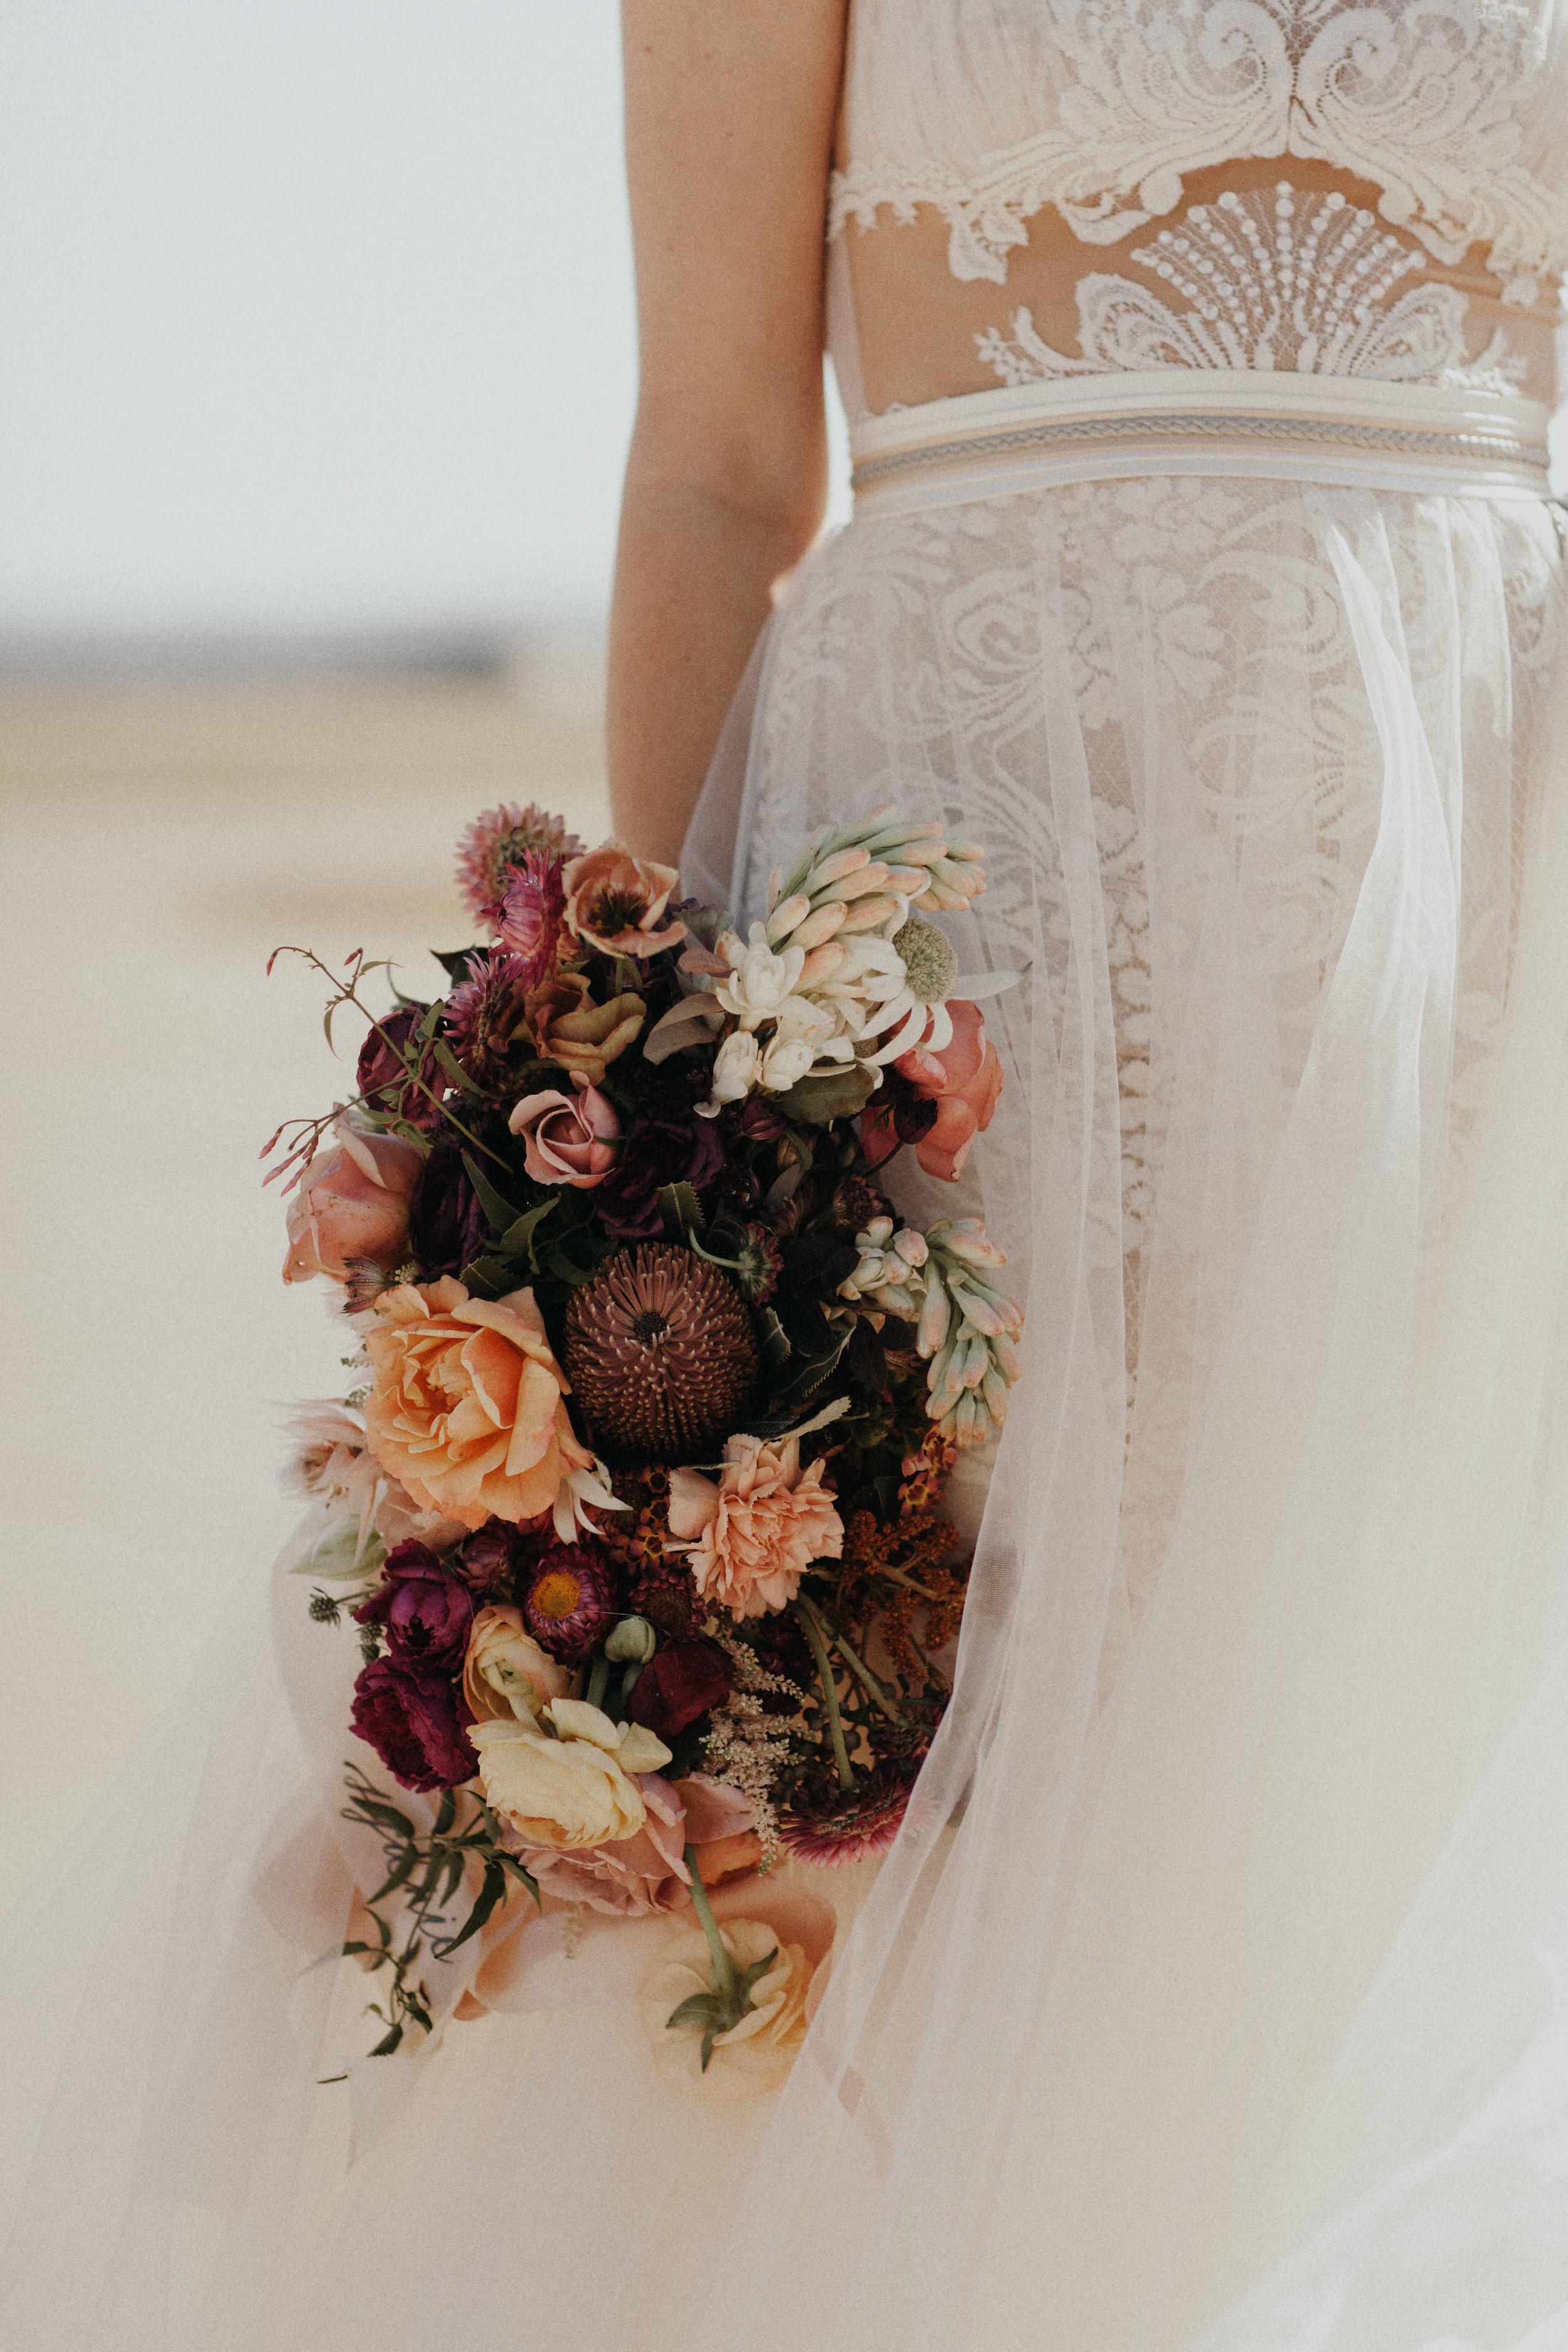 jessica-zimmerman-events-floral-design-coordination-planning-planner-little-rock-conway-arkansas-southern-florist-wedding-home-work-family-balance-business-mentor-outdoor-wedding-airplane-hangar